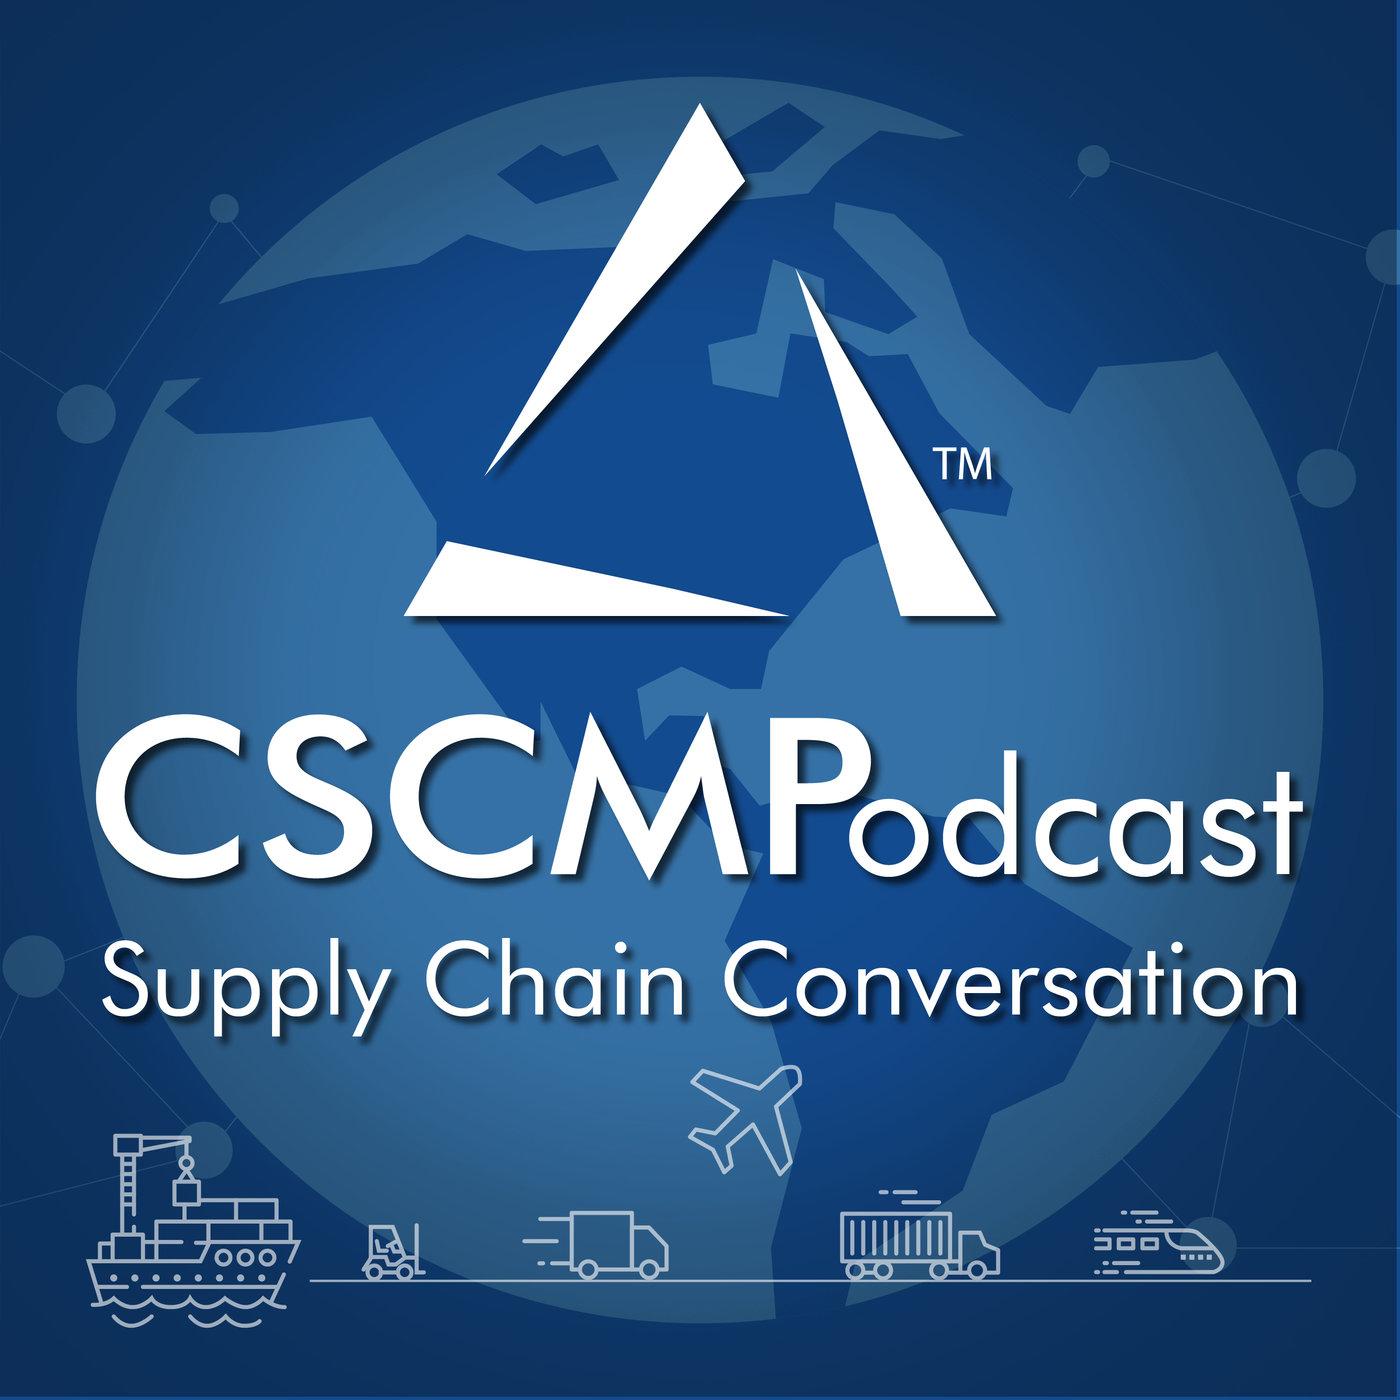 CSCMPodcast: Supply Chain Conversation - CSCMP show art